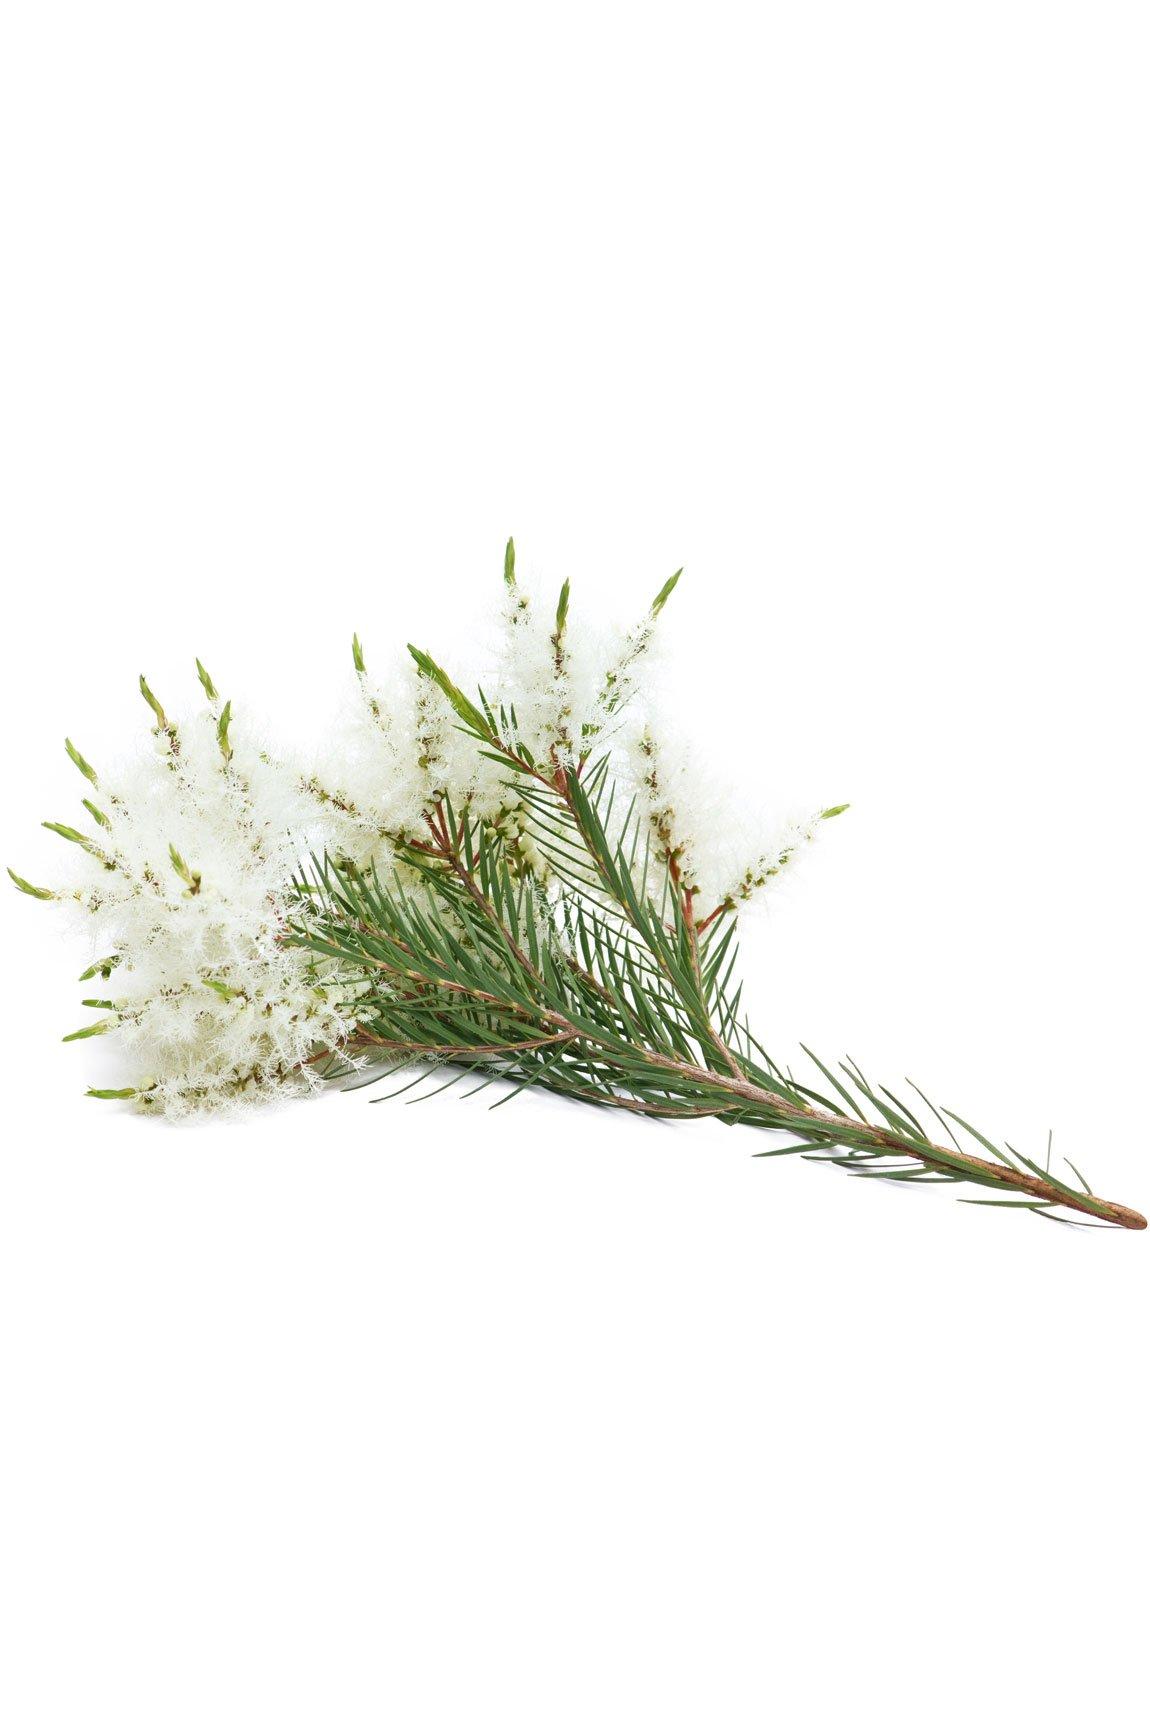 doTERRA Melaleuca Touch - Melaleuca alternifolia - Roll-On - 10ml